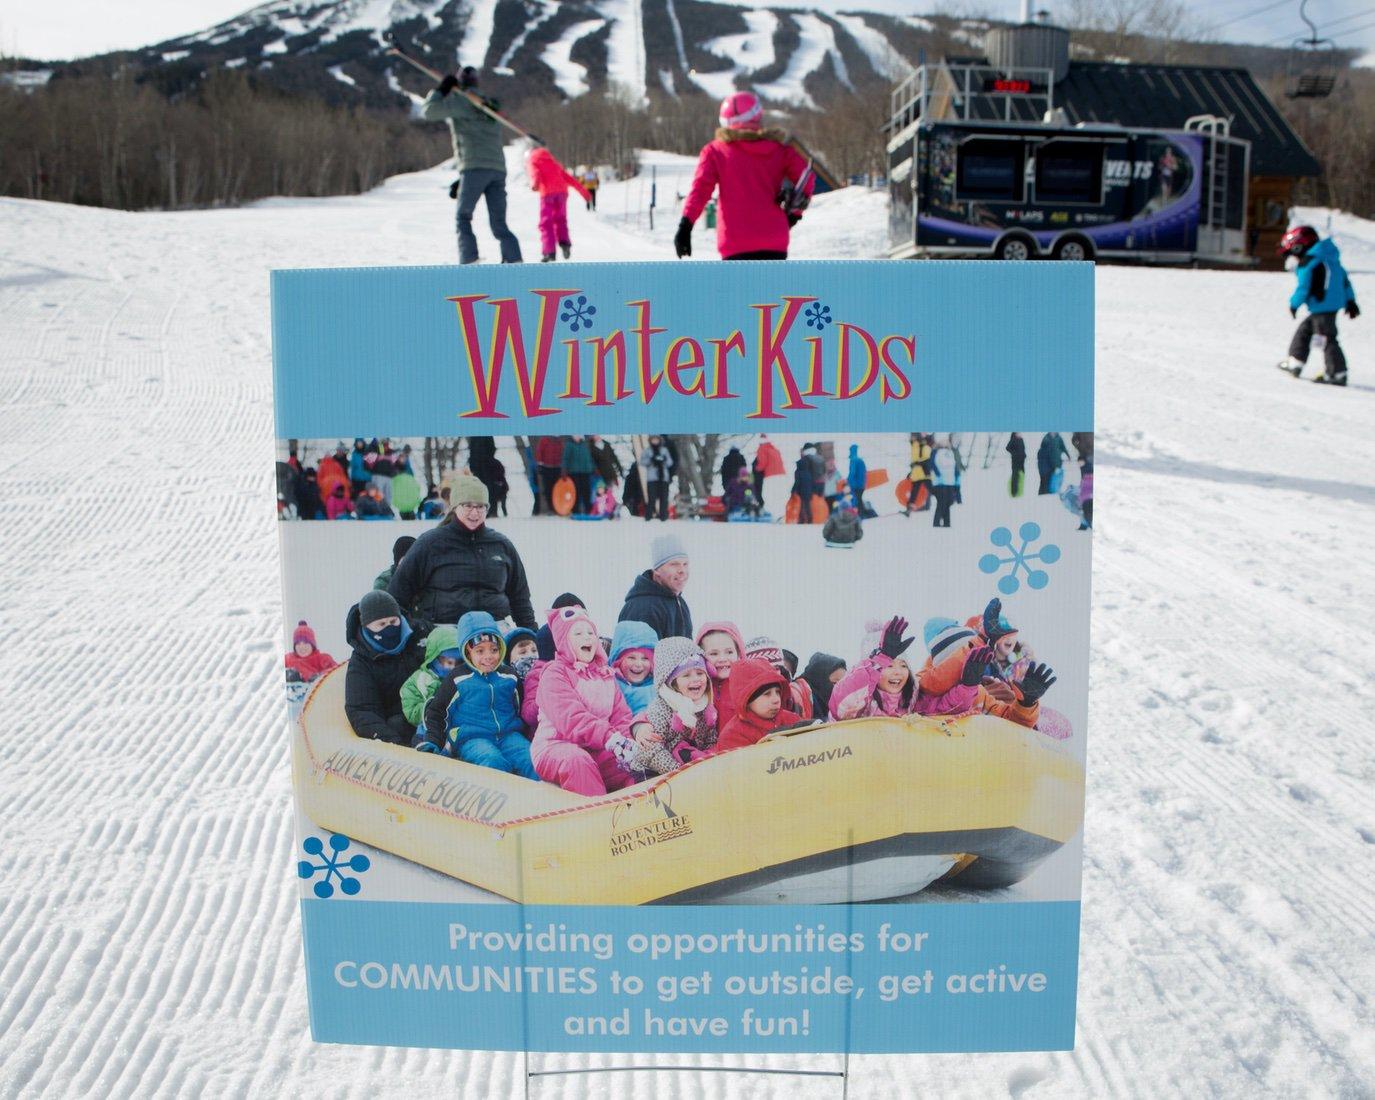 WinterKids Downhill24 2017-SDP_053